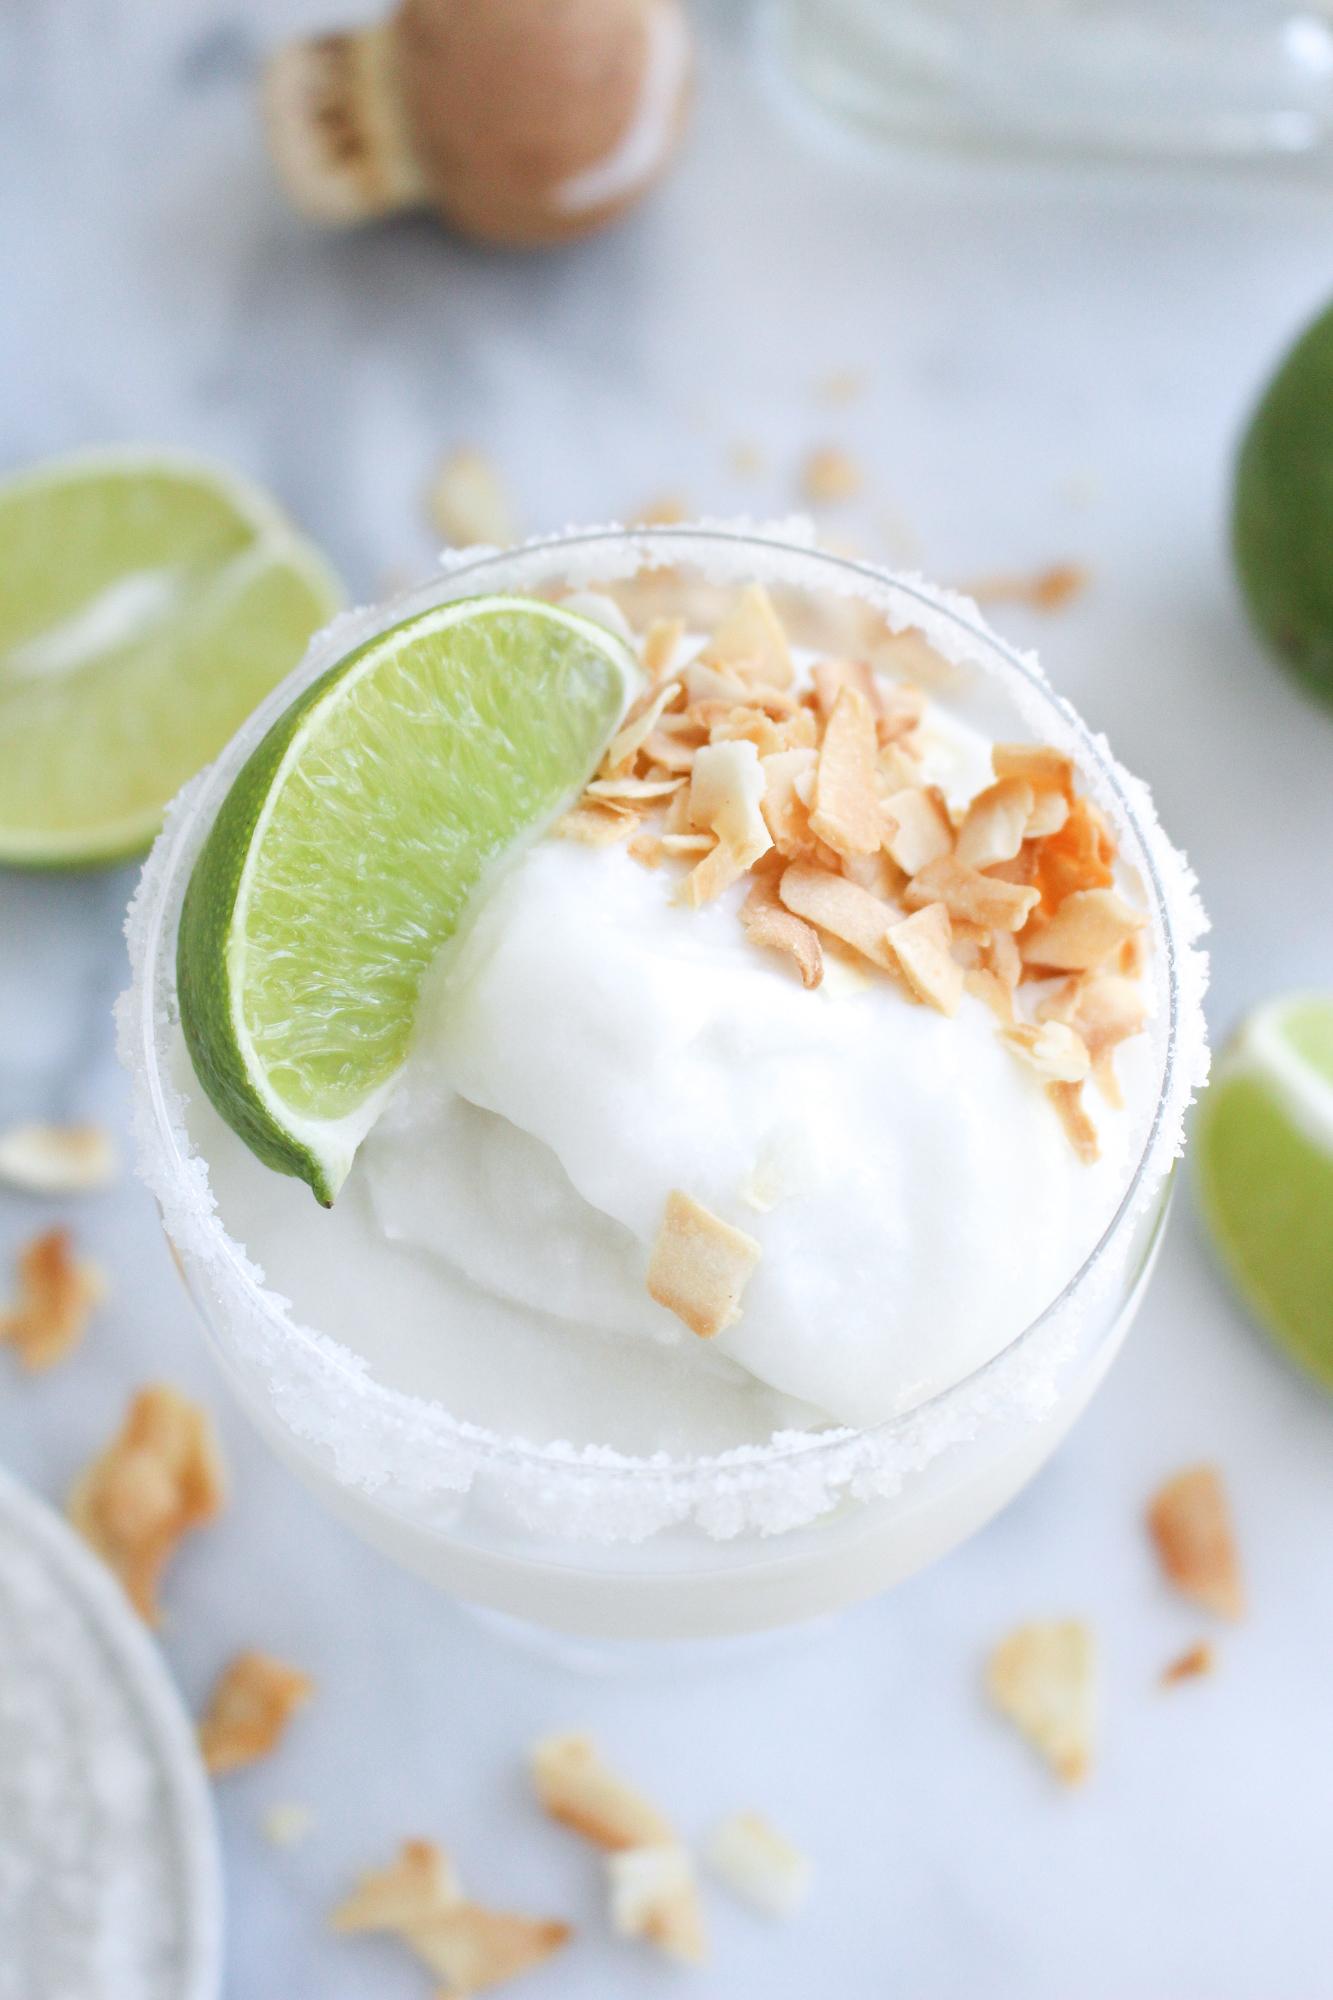 Coconut Margarita Slushies (made in an ice cream machine!)